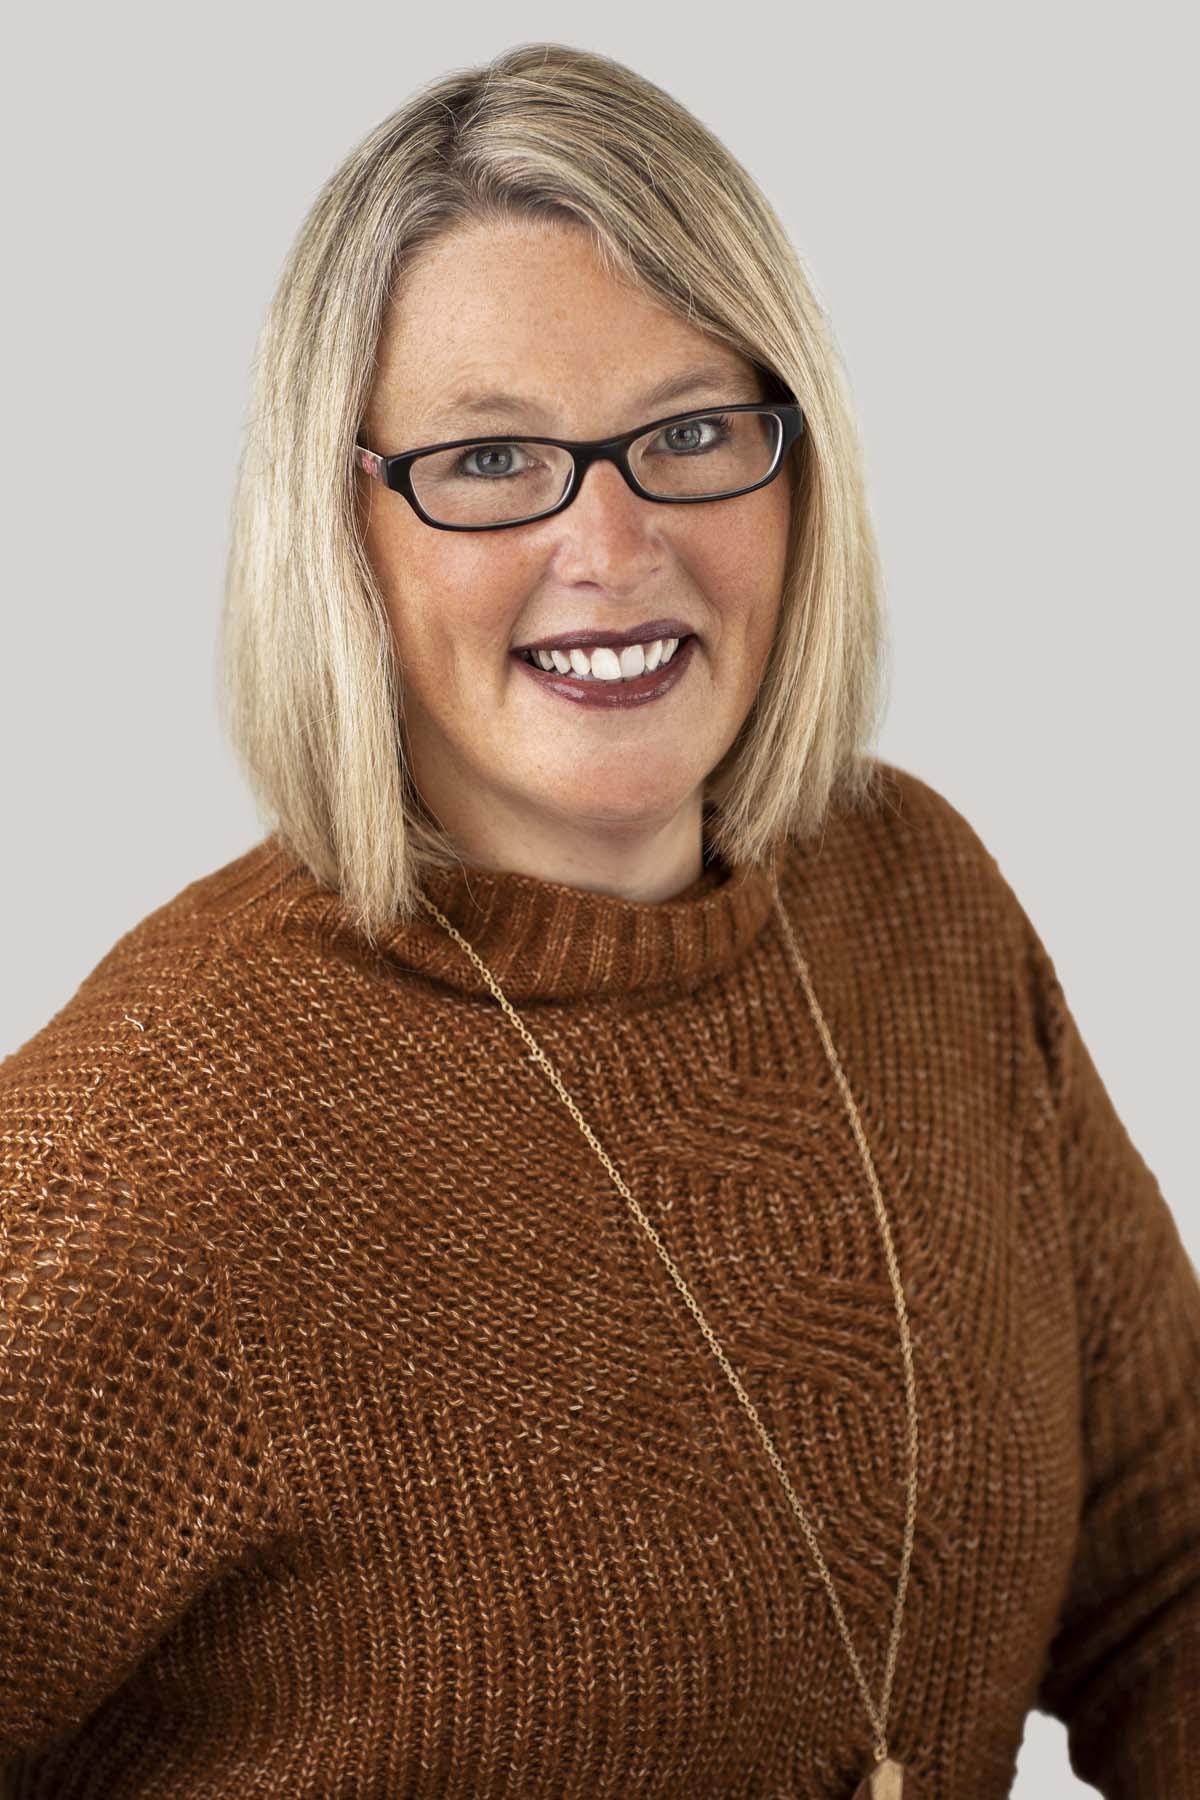 Courtney McCloskey